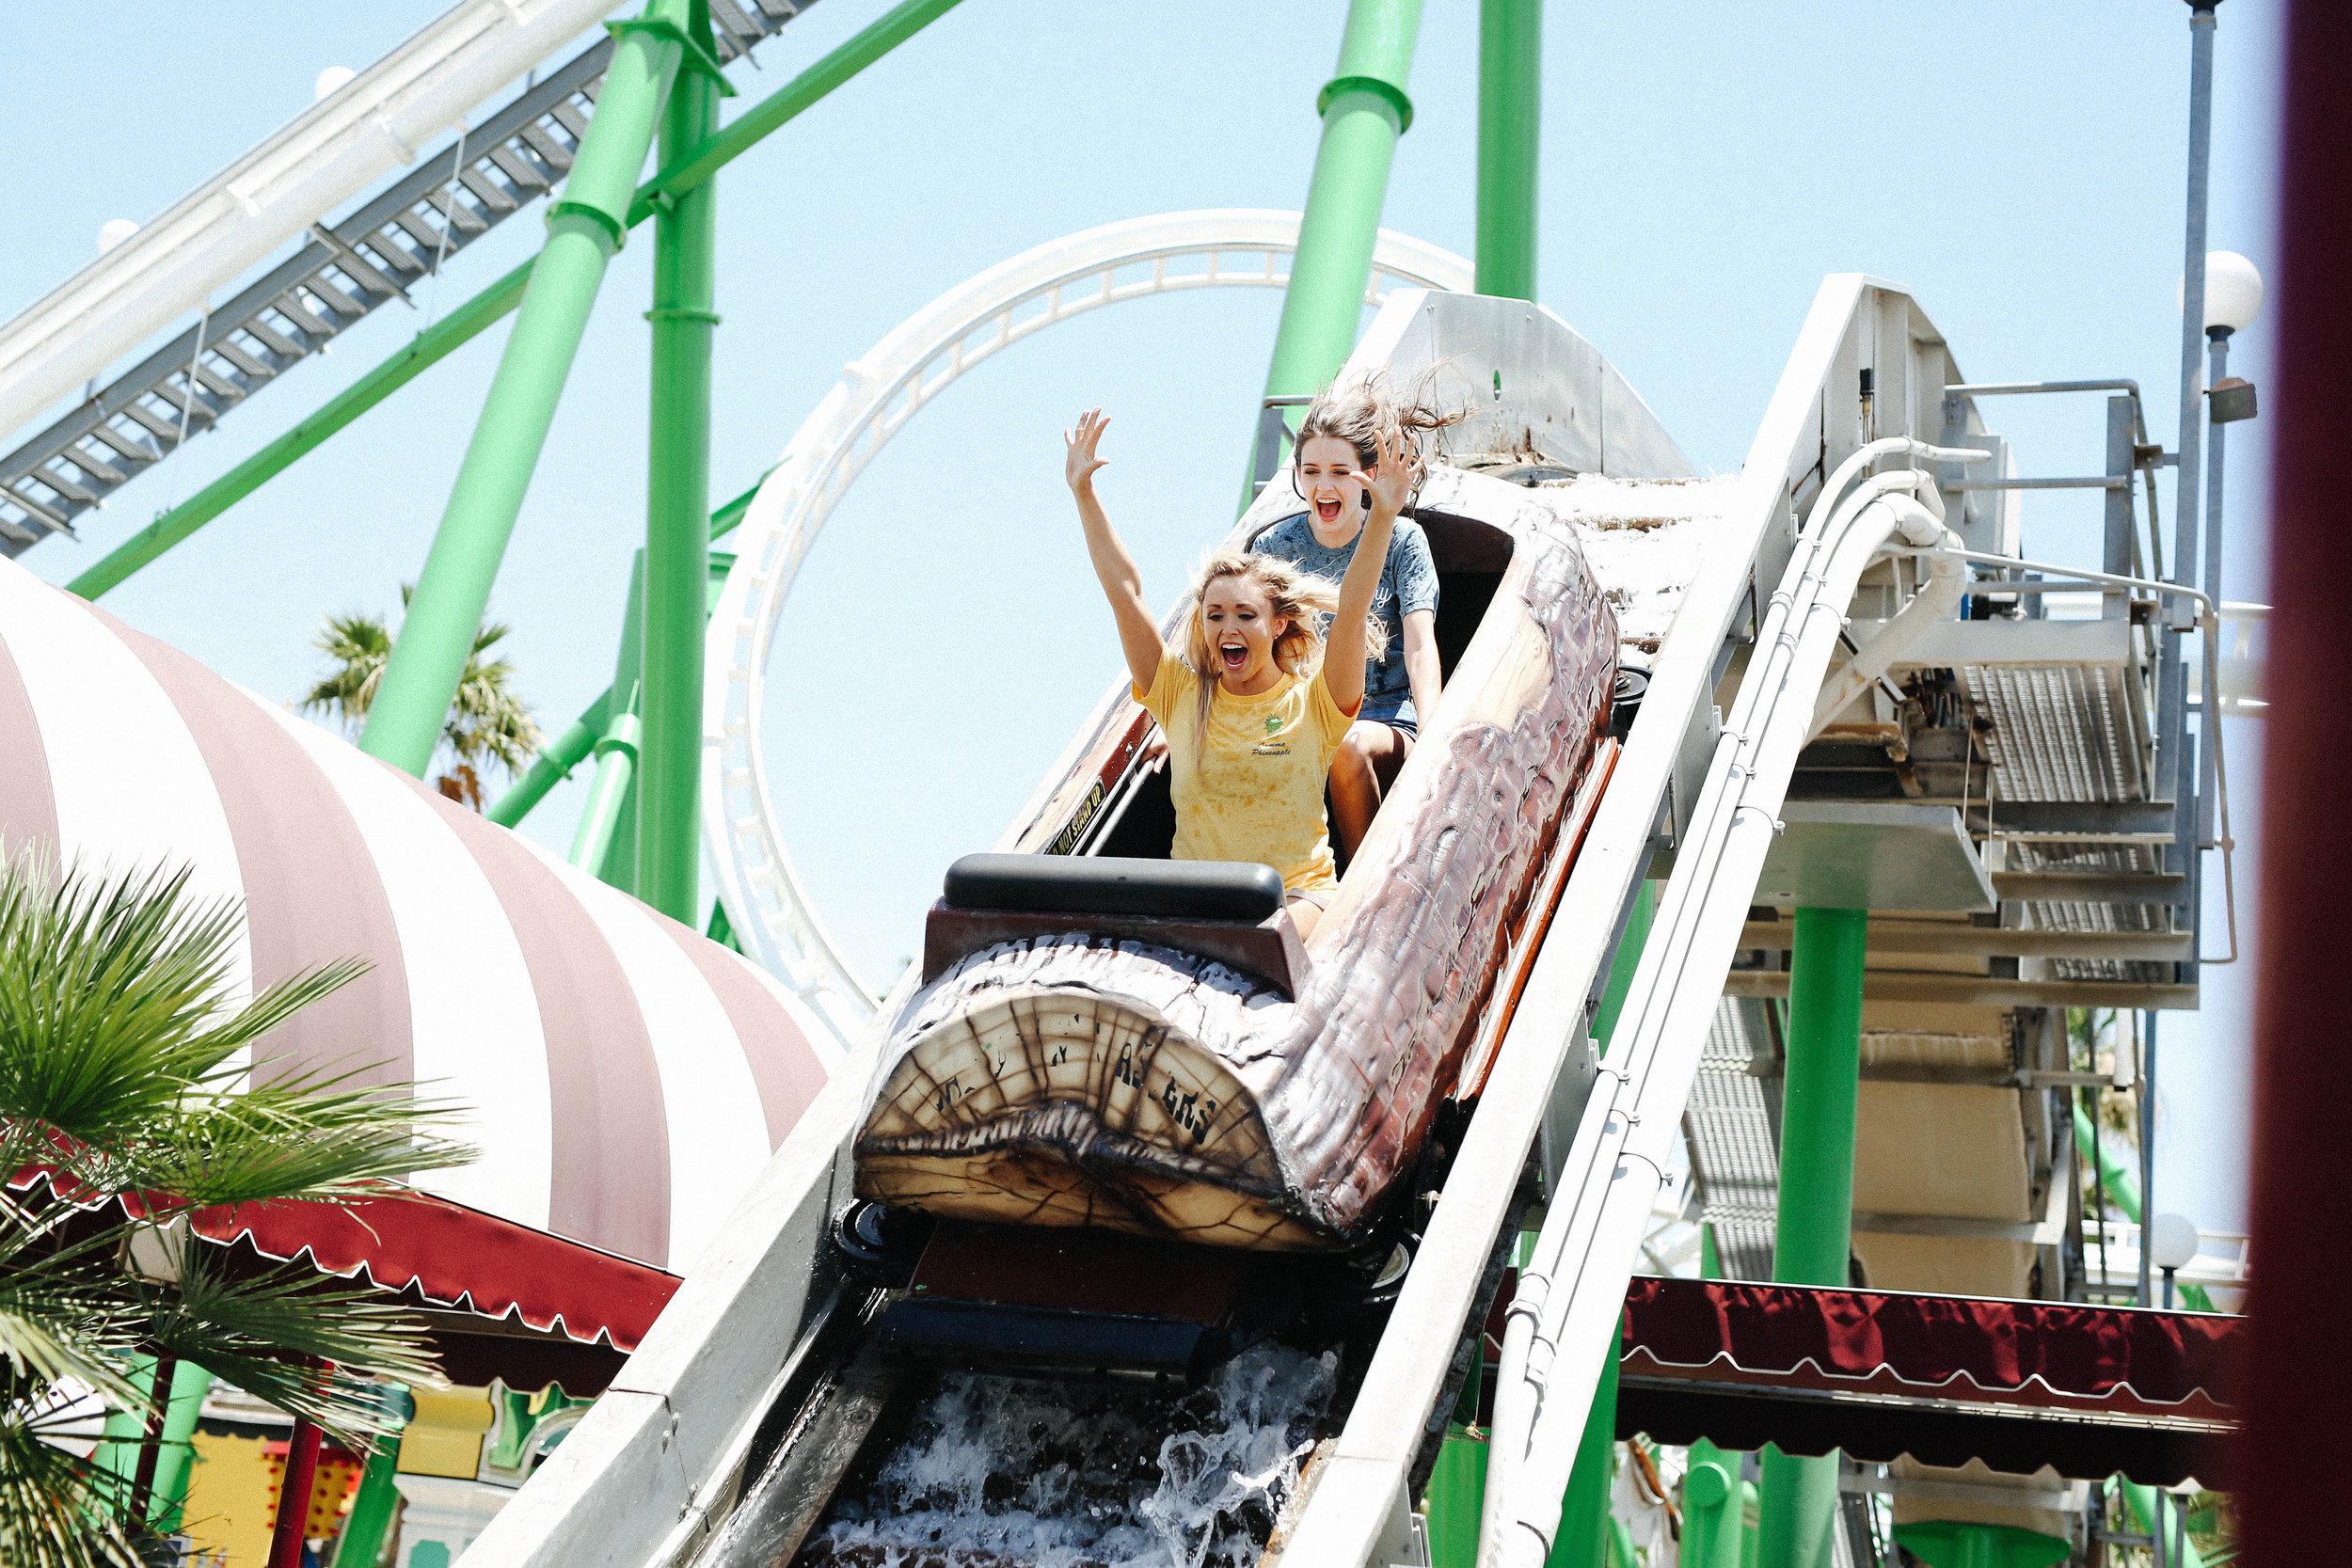 Image of Girls on the drop of Splashdown